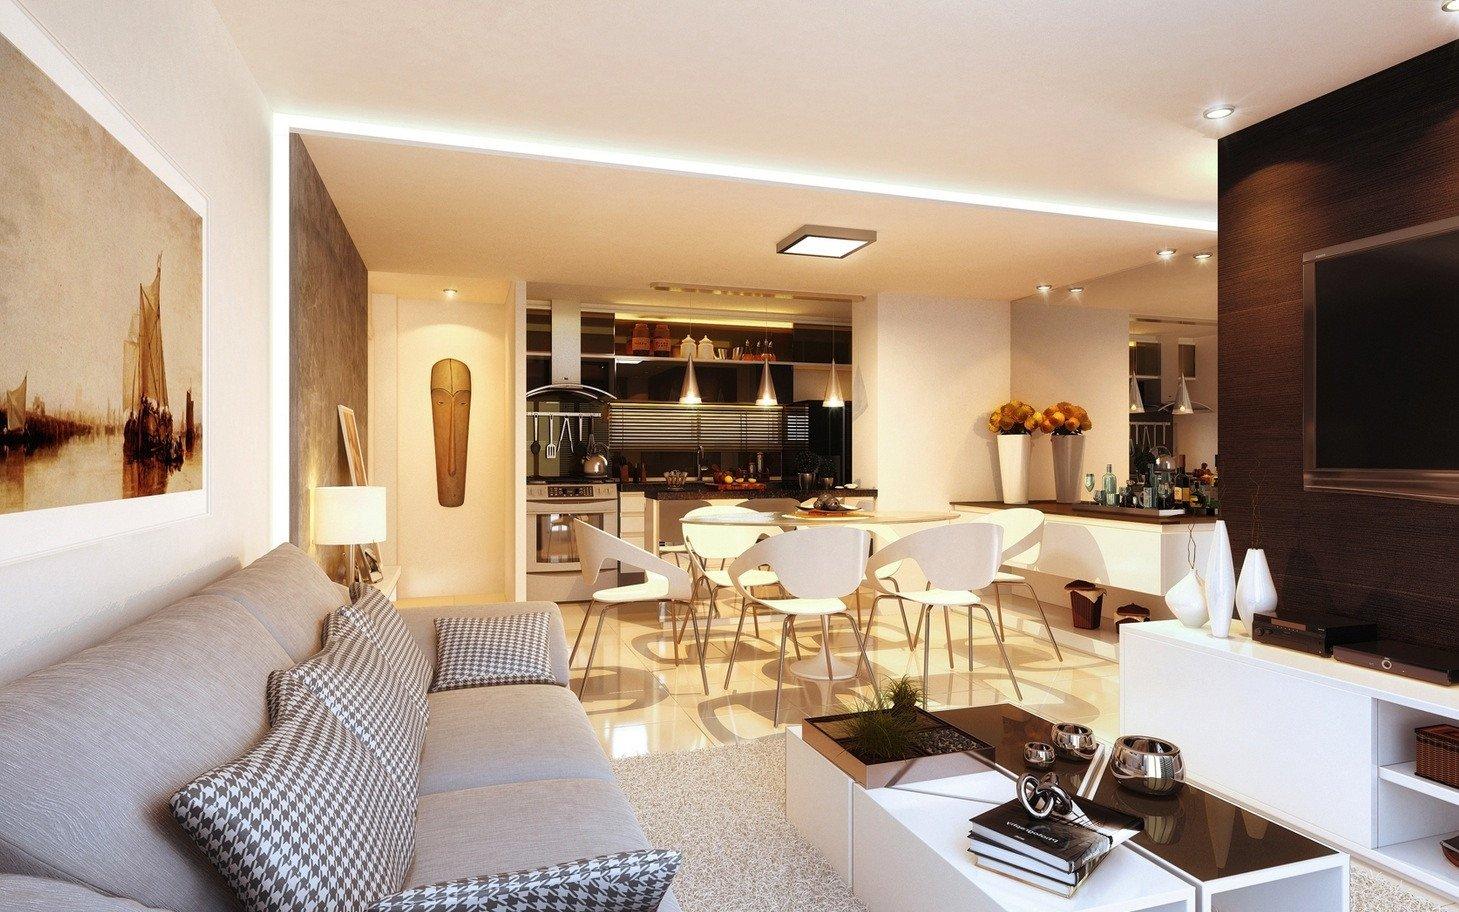 Open Concept Living Room Ideas Inspirational 23 Open Concept Apartment Interiors for Inspiration